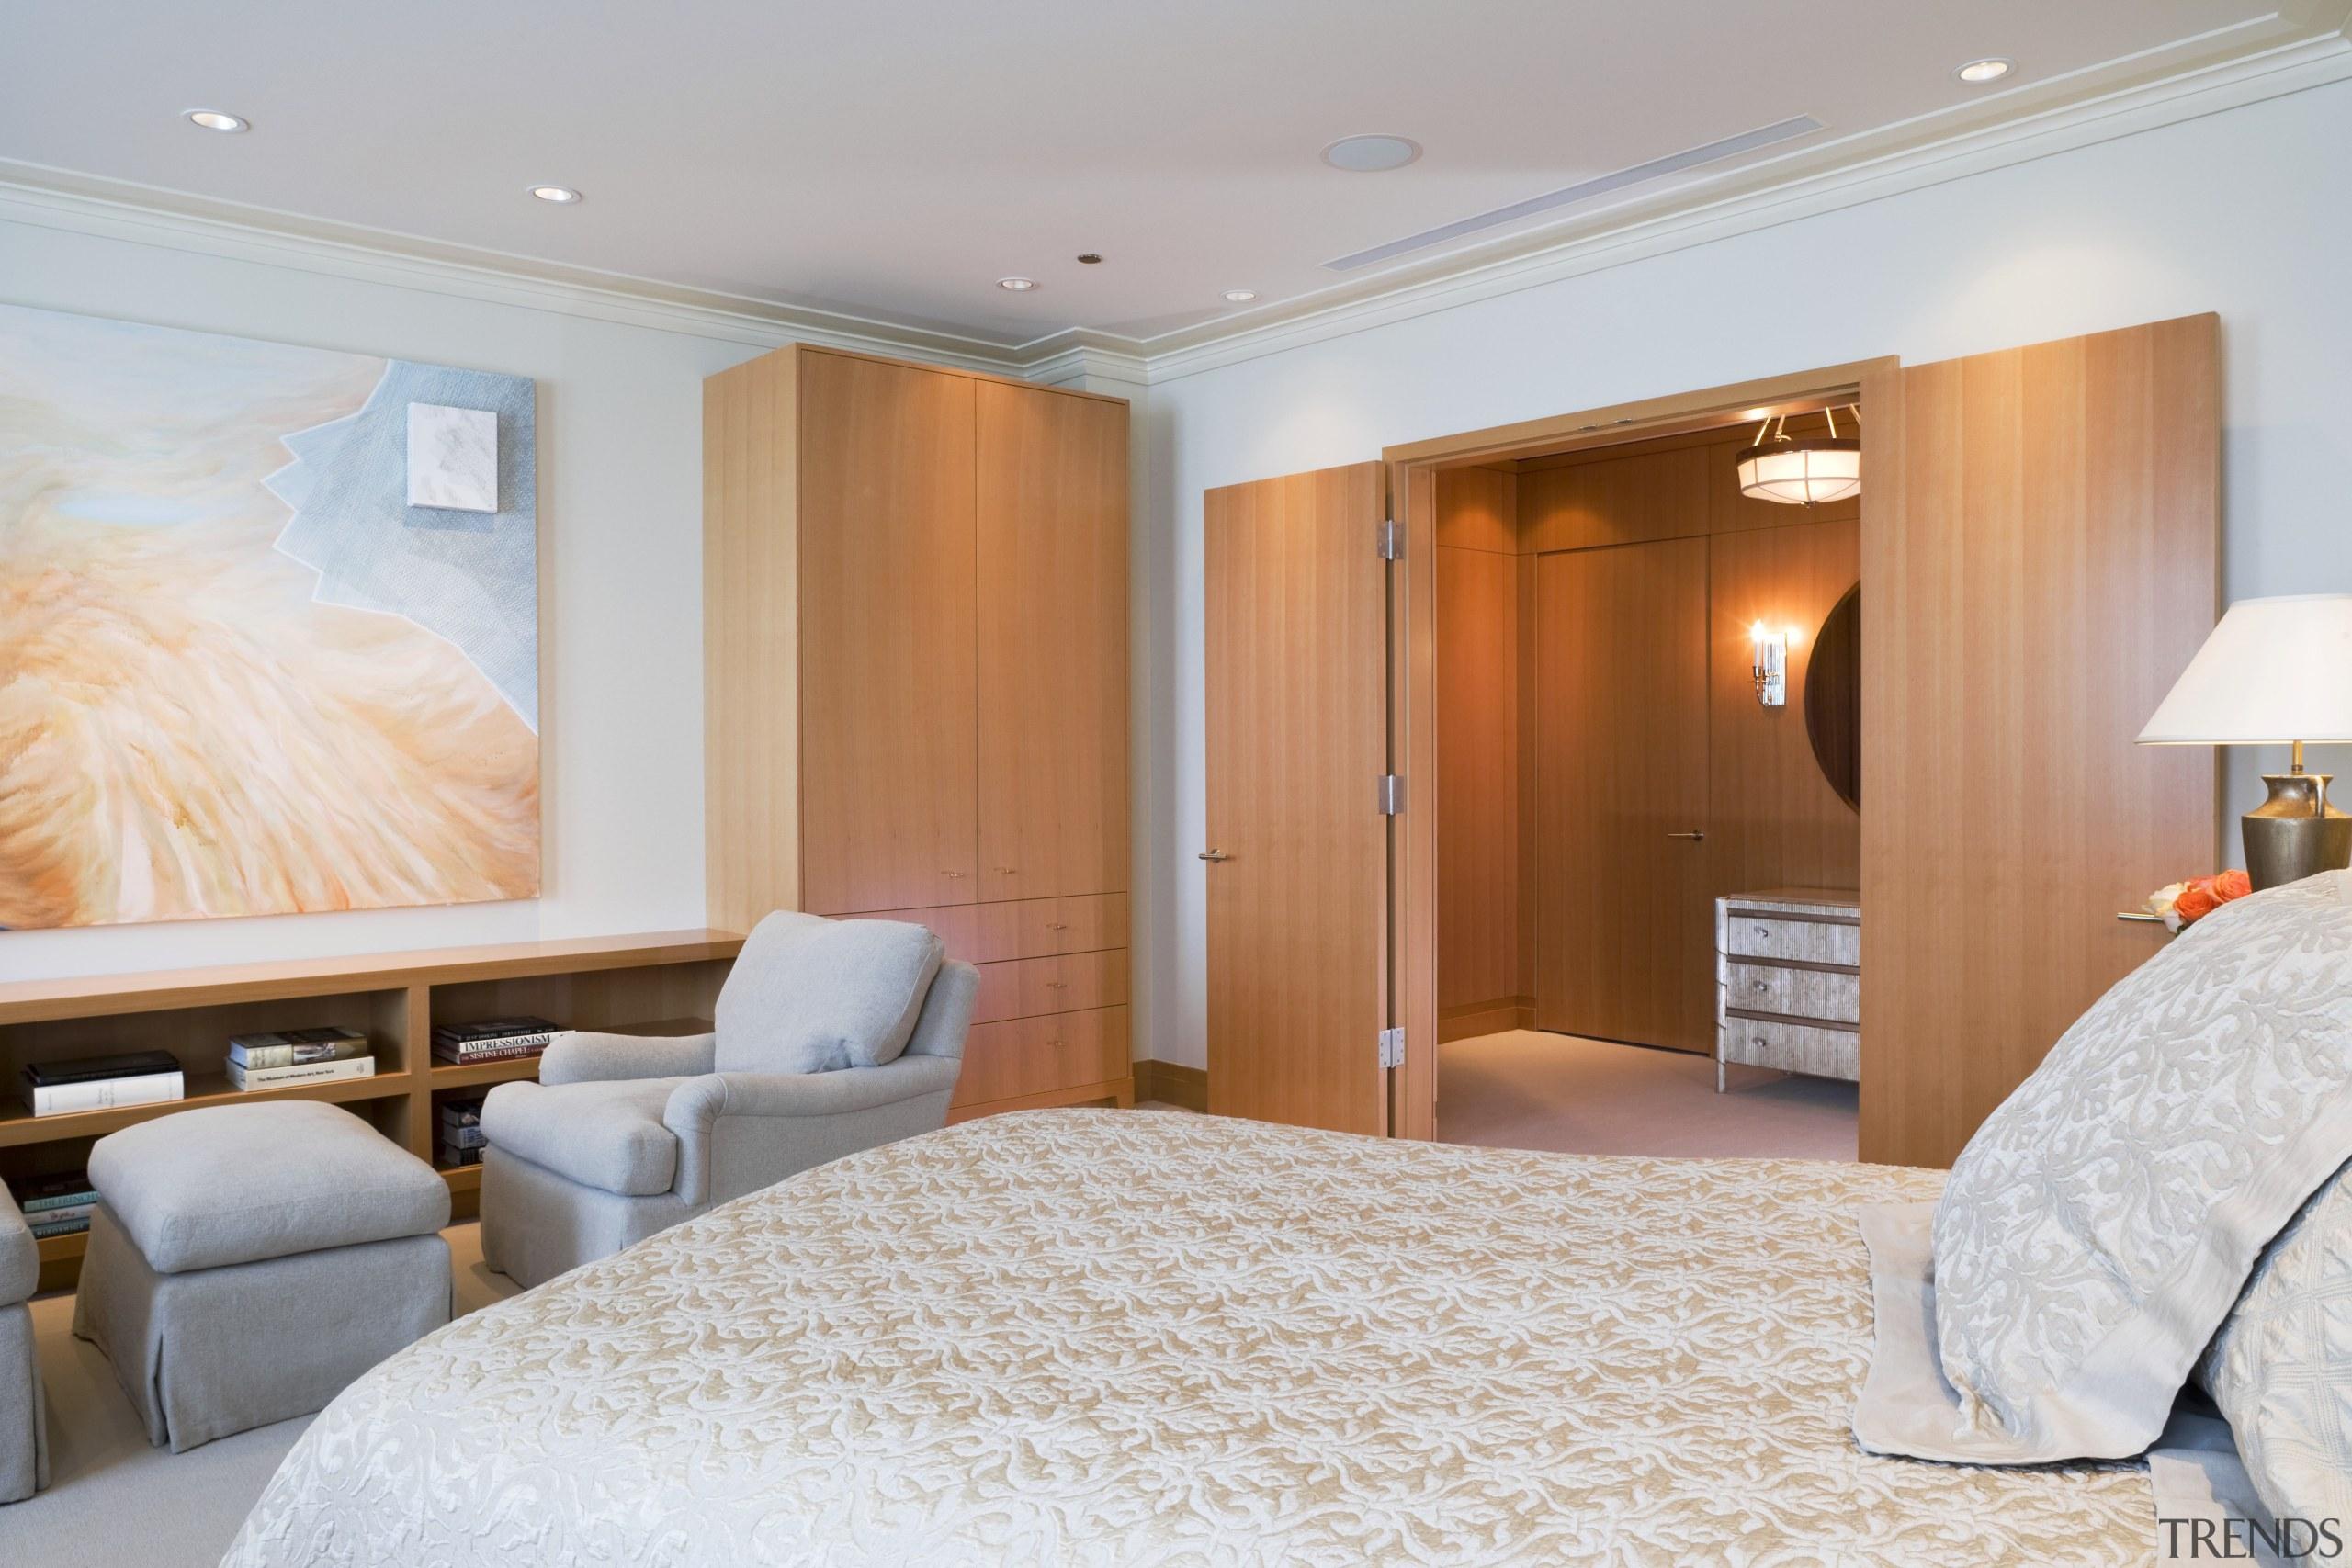 View of bedroom featuring bedroom room furnishings, artwork, bedroom, ceiling, interior design, real estate, room, suite, wall, gray